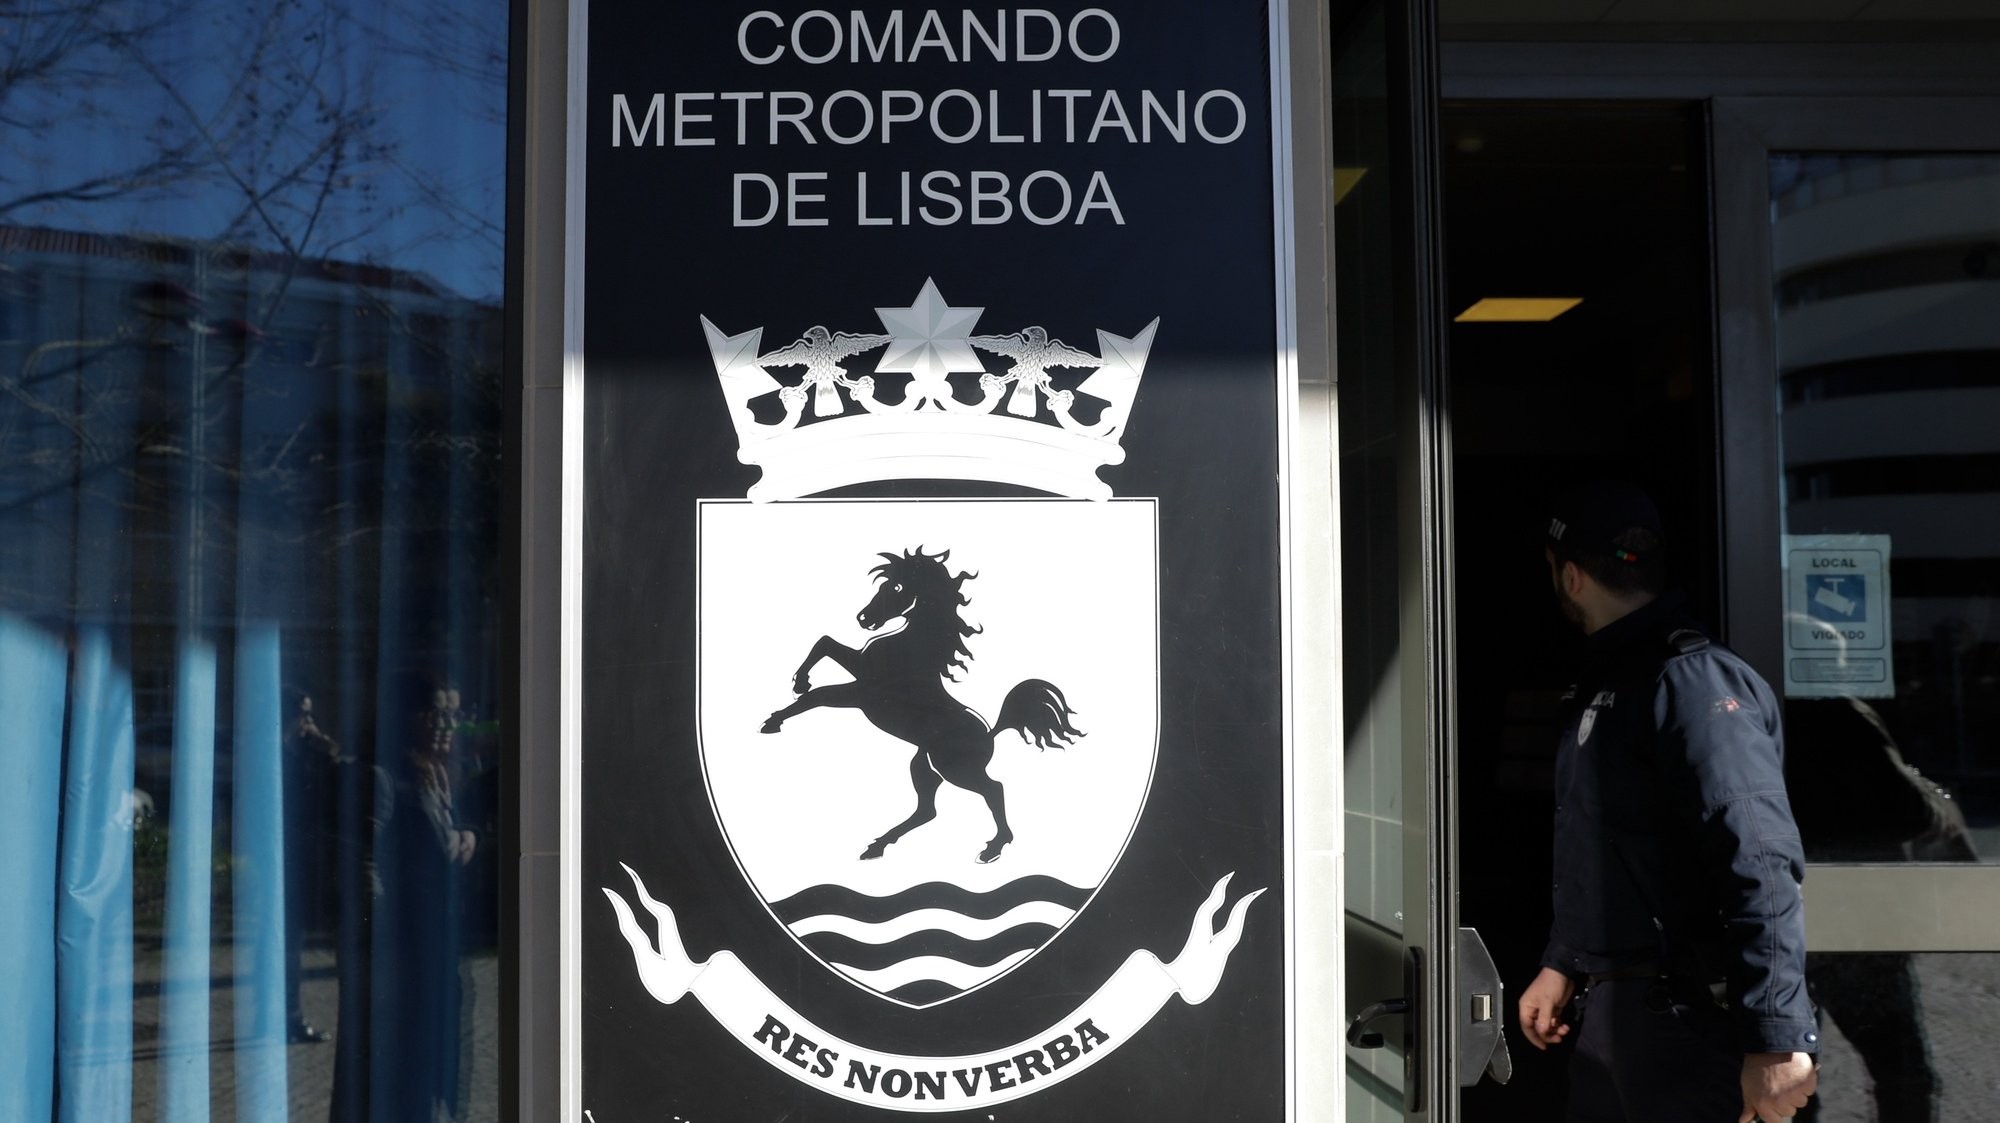 Comando Metropolitano da PSP de Lisboa, 12 de fevereiro de 2019. ANTÓNIO COTRIM/LUSA